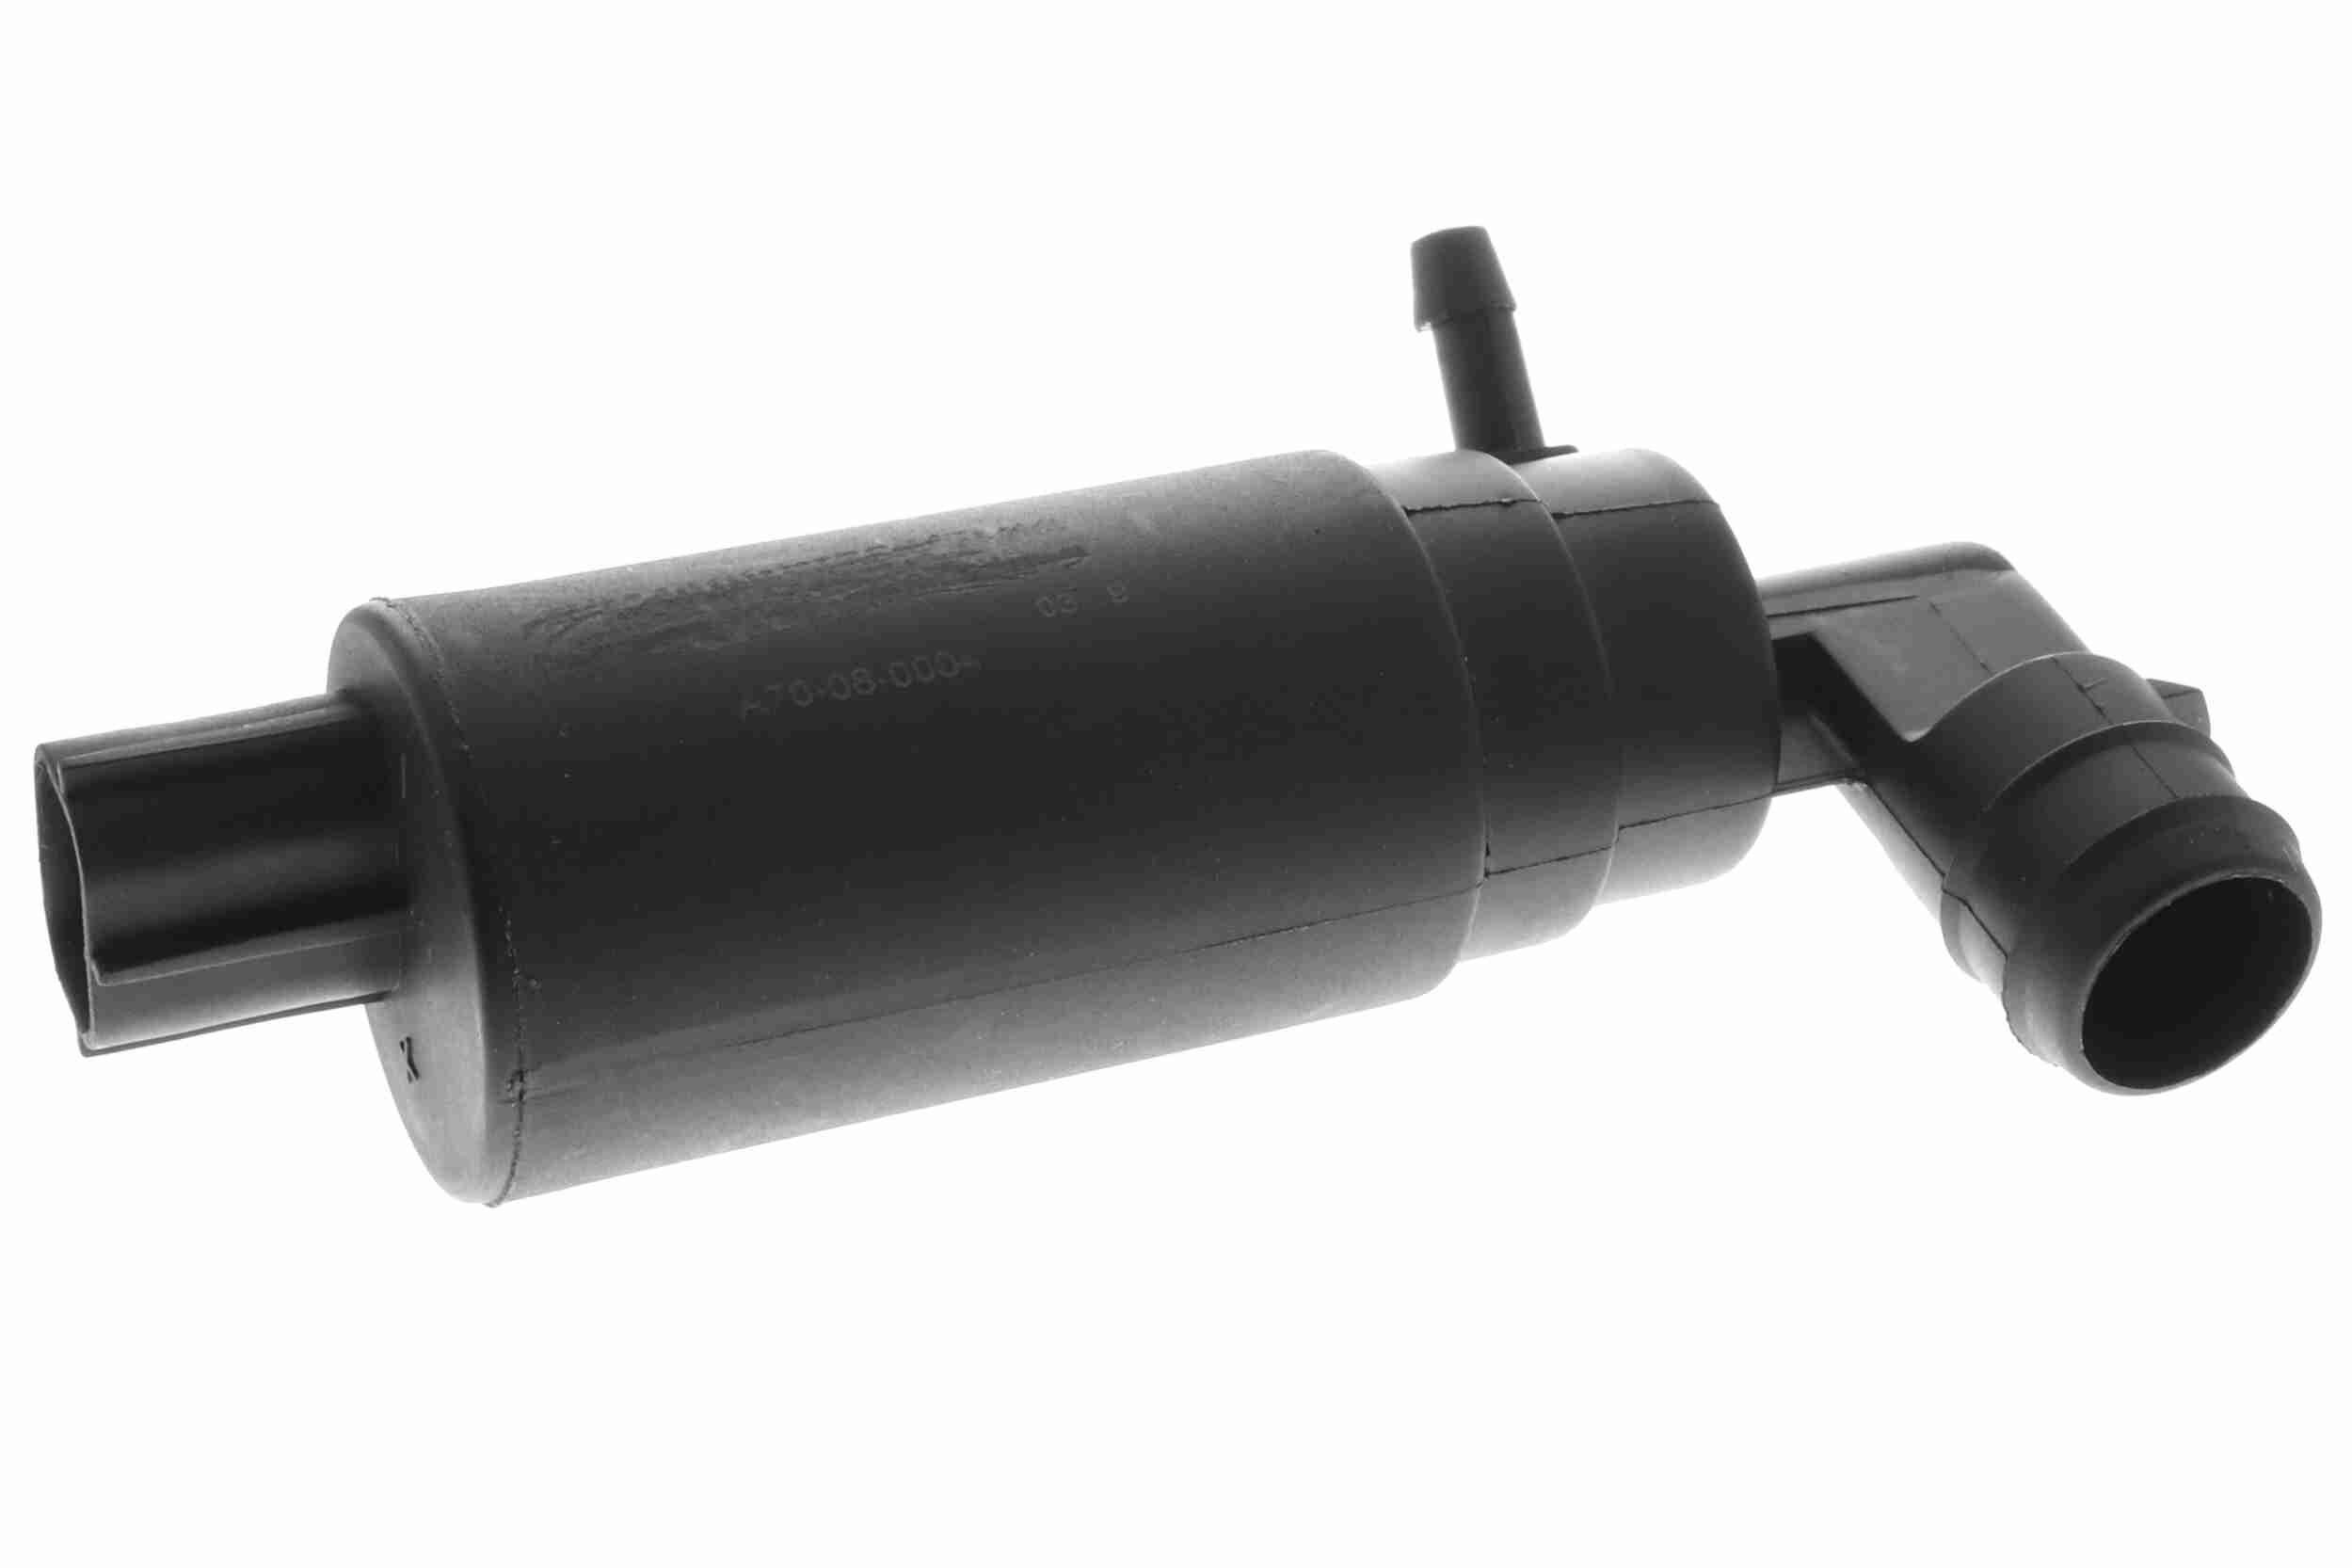 Bomba de Limpiaparabrisas A70-08-0004 ACKOJA A70-08-0004 en calidad original